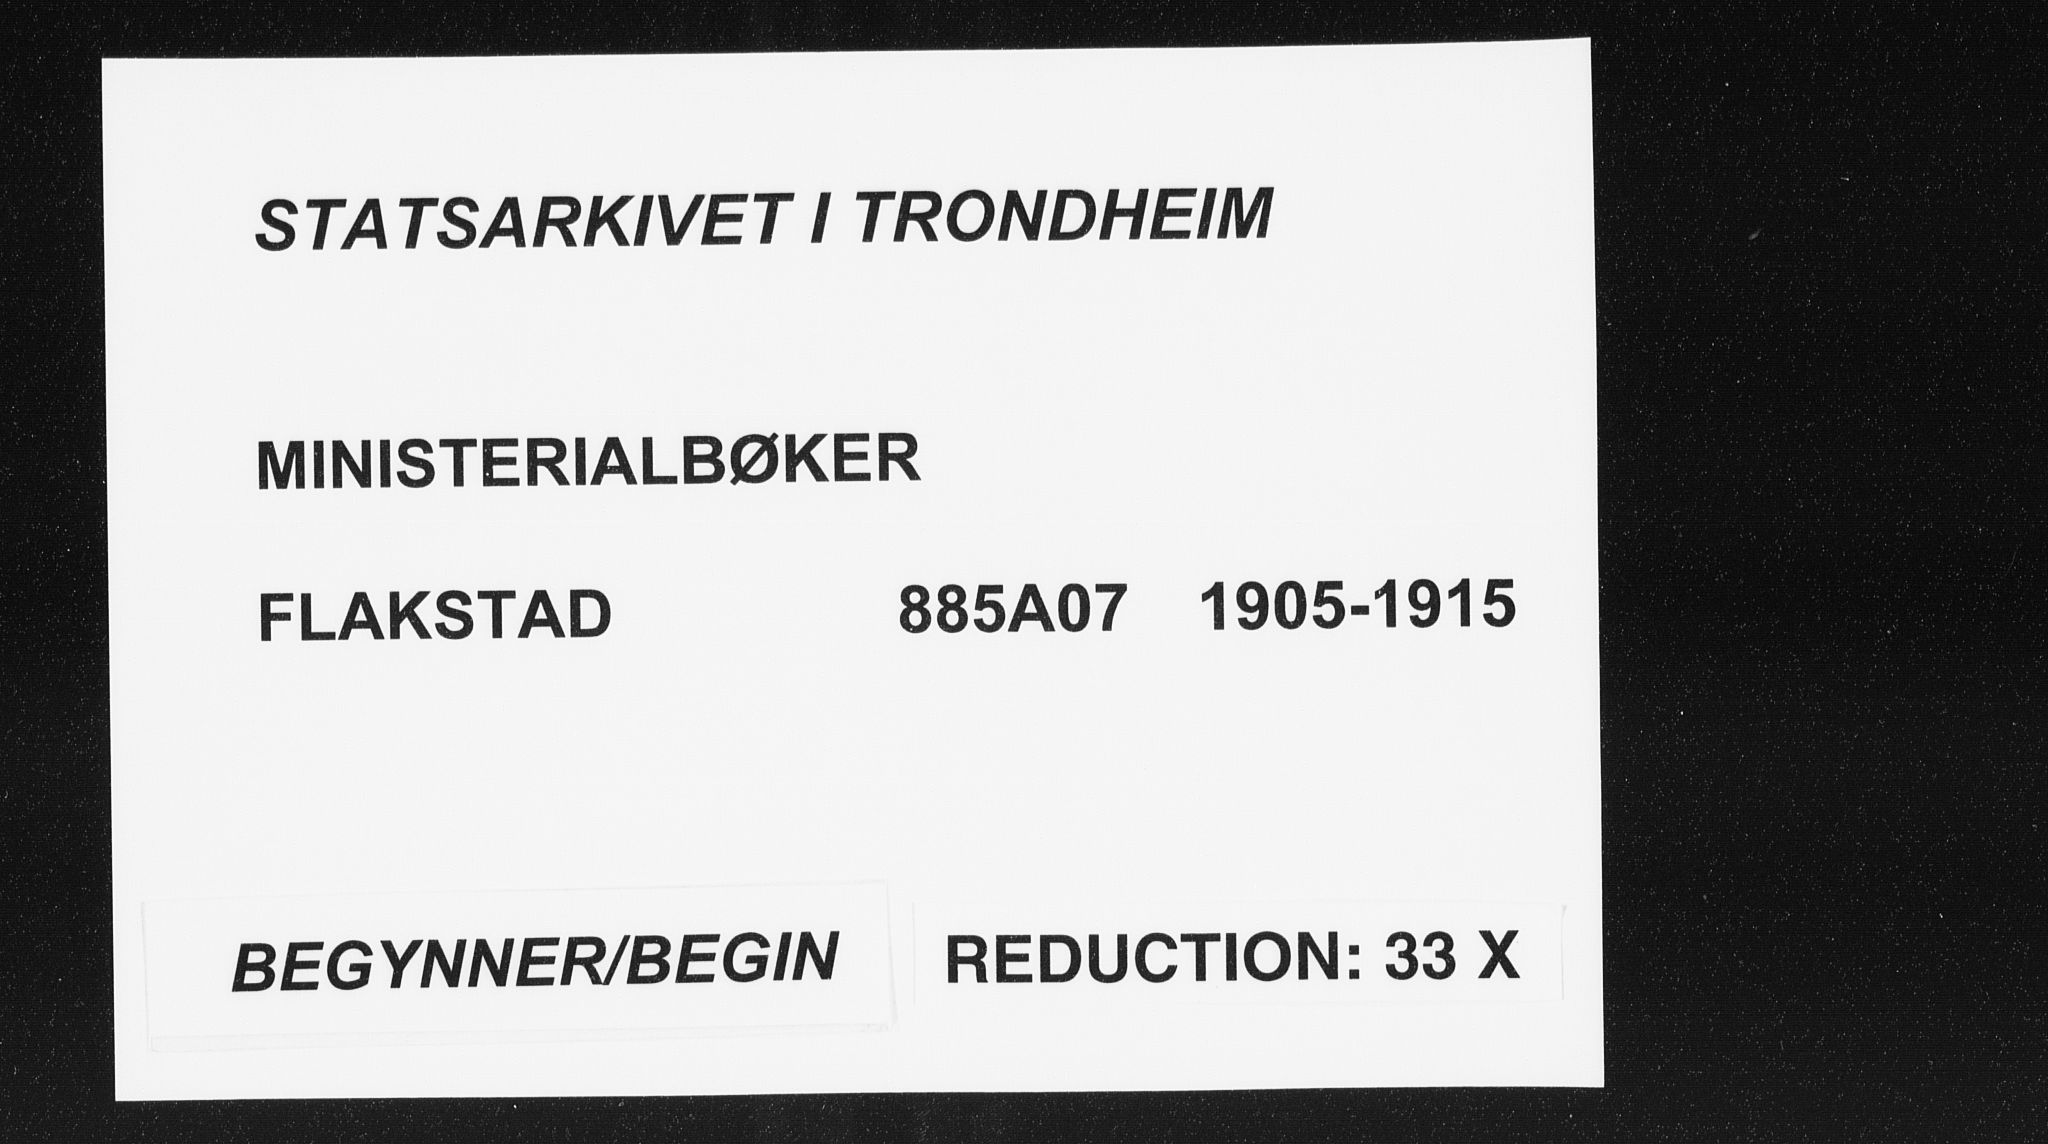 SAT, Ministerialprotokoller, klokkerbøker og fødselsregistre - Nordland, 885/L1206: Ministerialbok nr. 885A07, 1905-1915